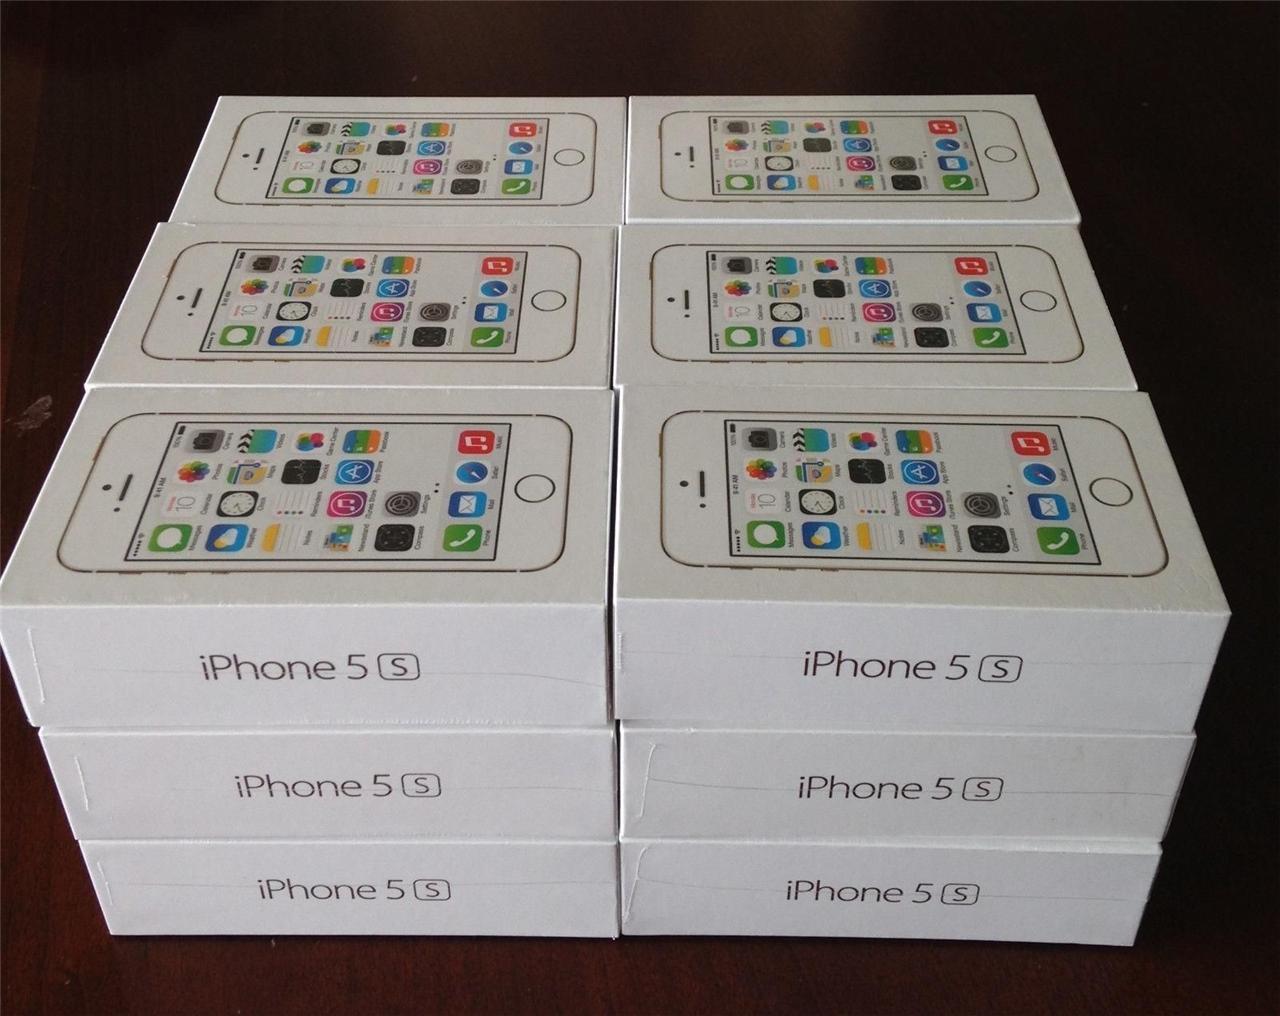 Iphone 5s Gold Box Wallpaper Iphone 5s Box